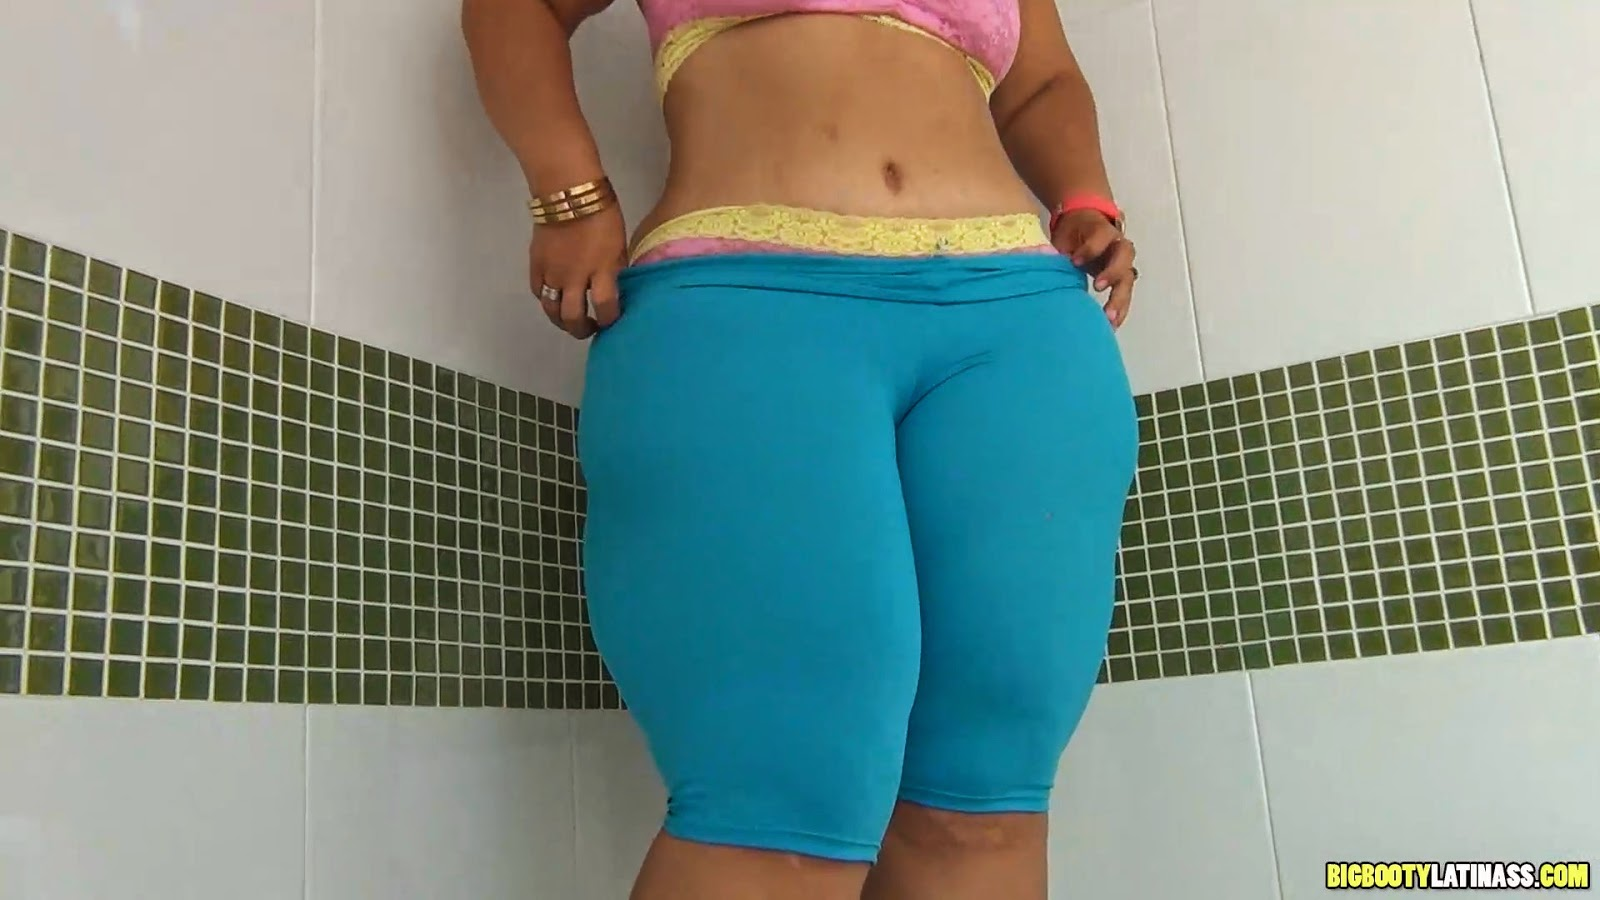 big booty latinass mega butt luciana marcia assoholics